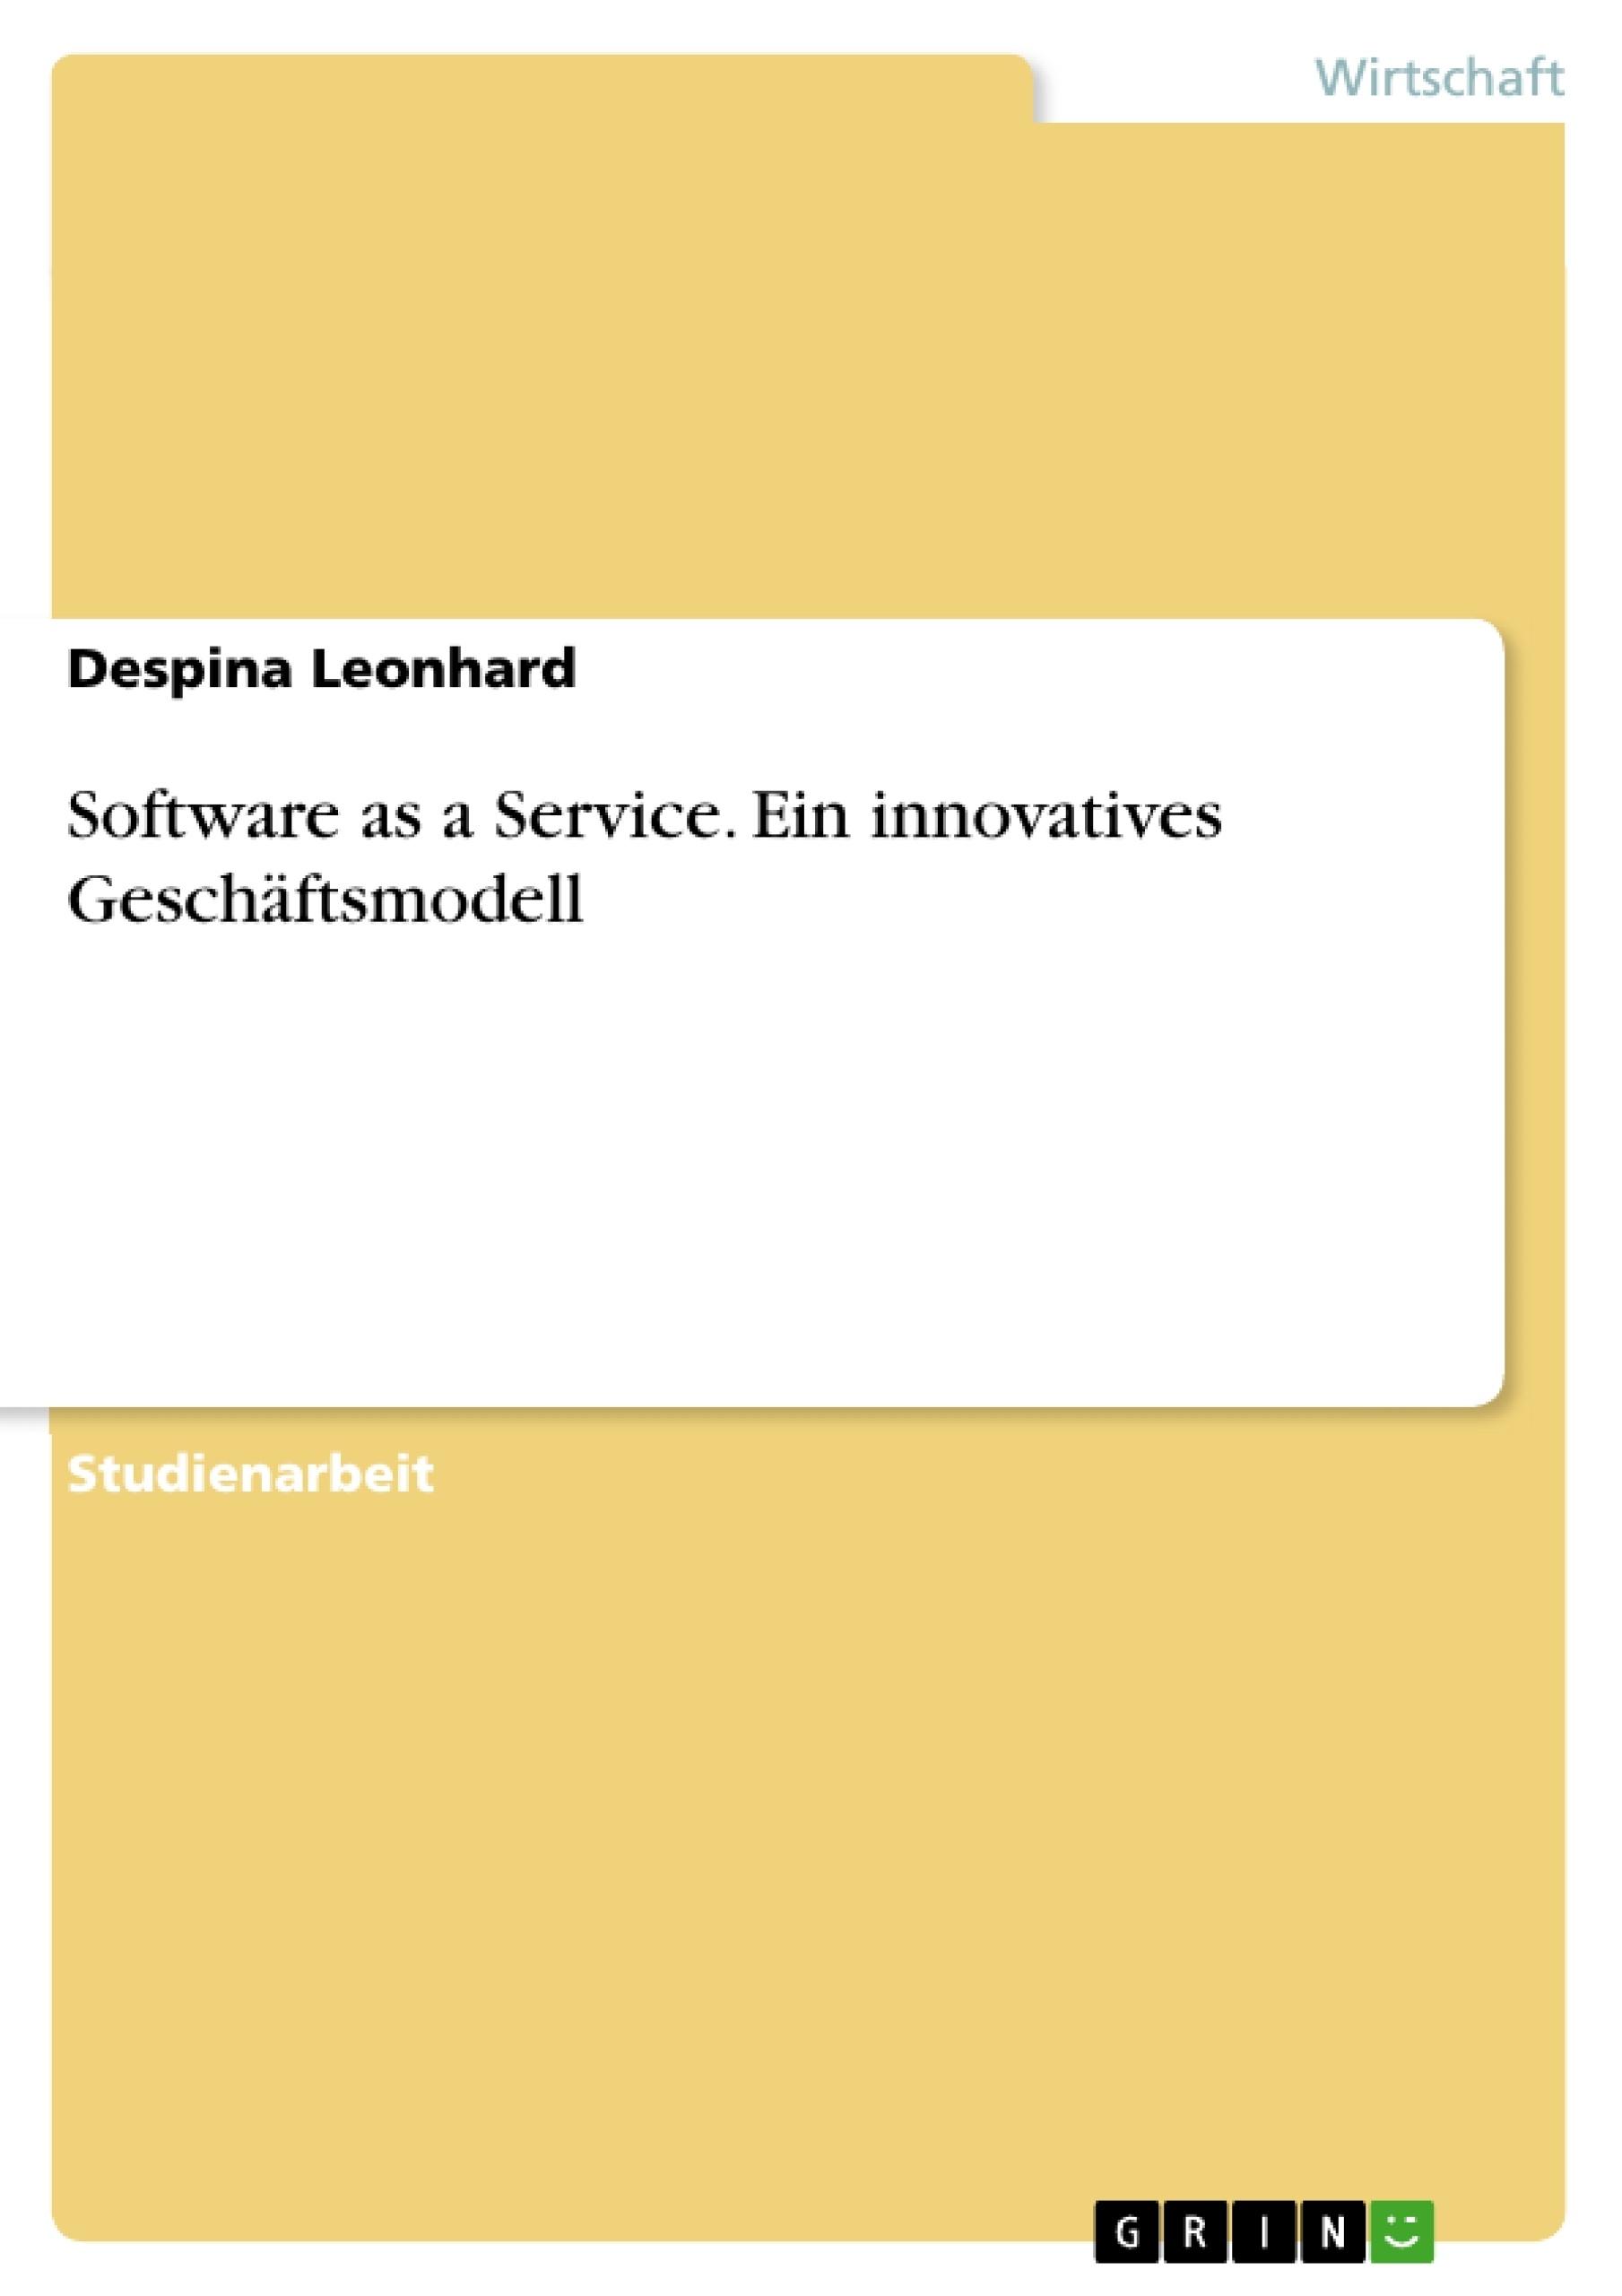 Titel: Software as a Service. Ein innovatives Geschäftsmodell